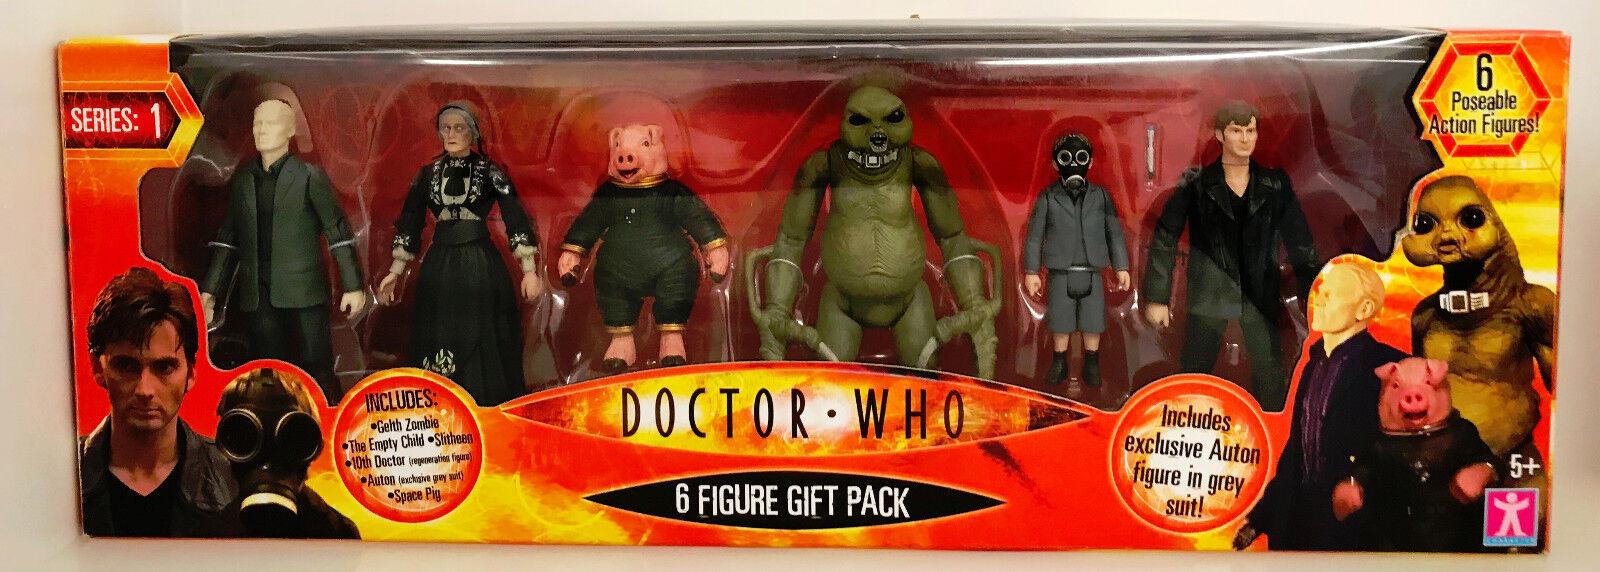 Doktor, 6 abb setzt srs 1 gelth zombie leeren kind 10. doc regen auton usw.